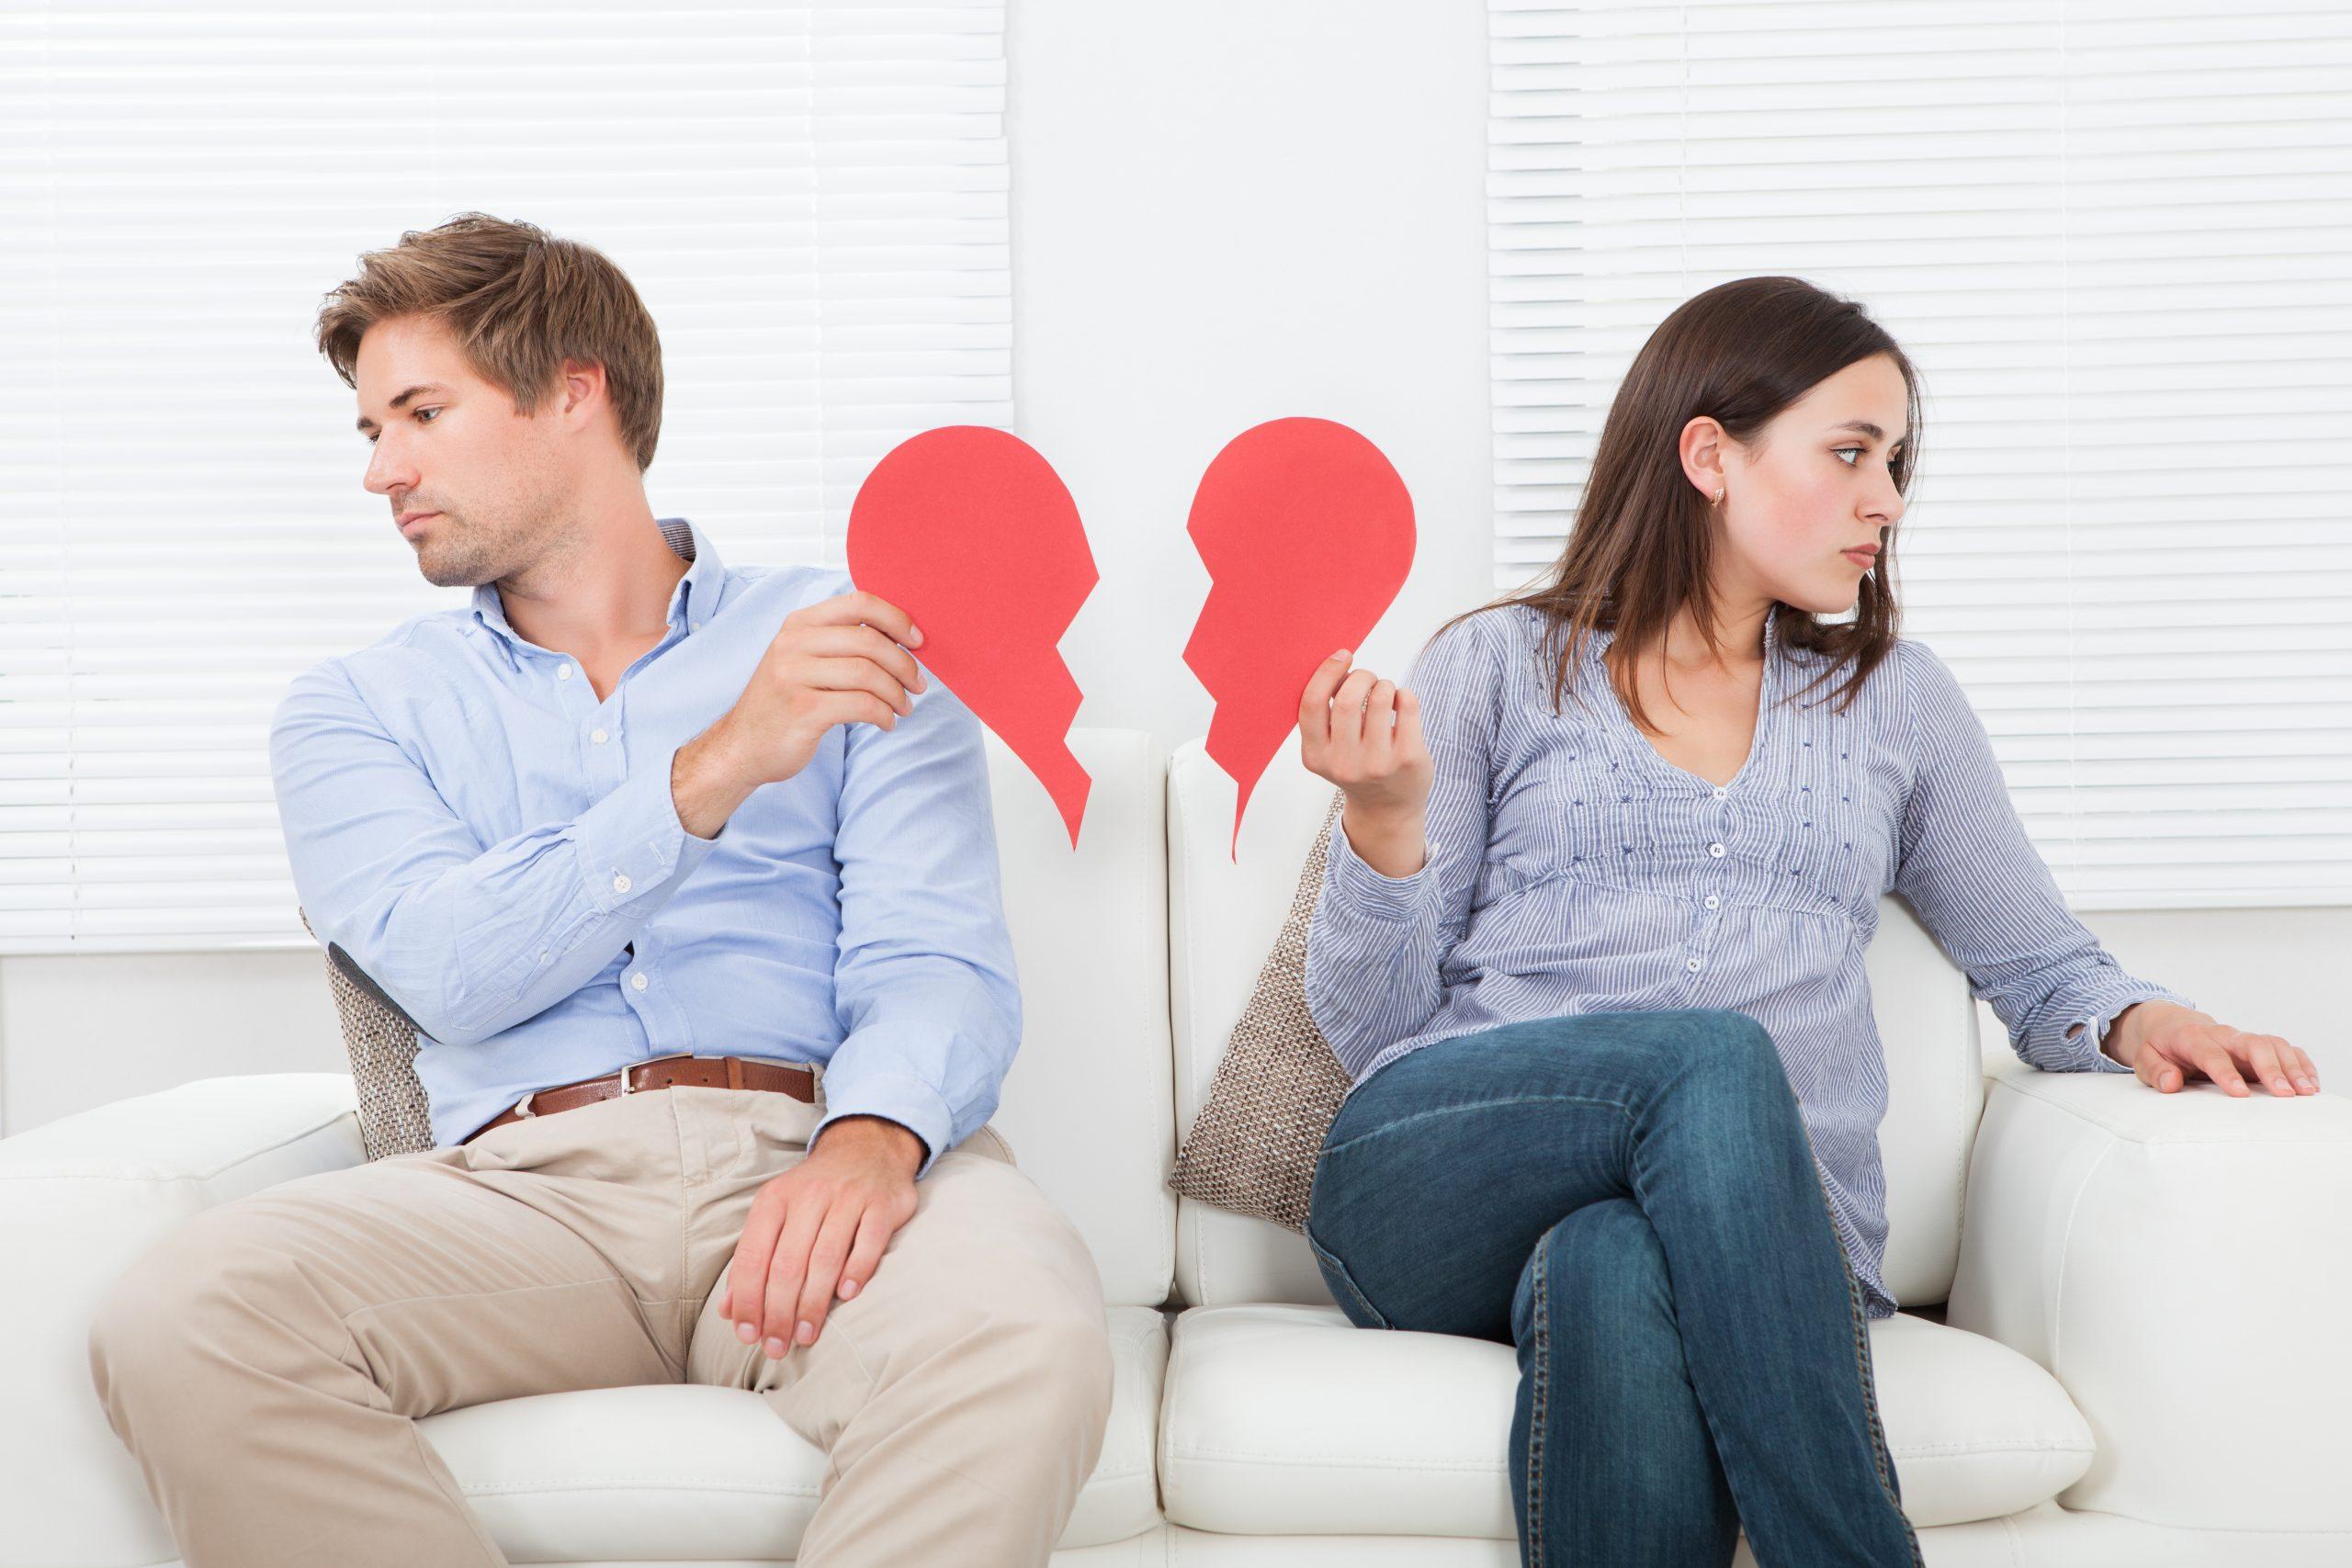 Lessen the Pain of Divorce